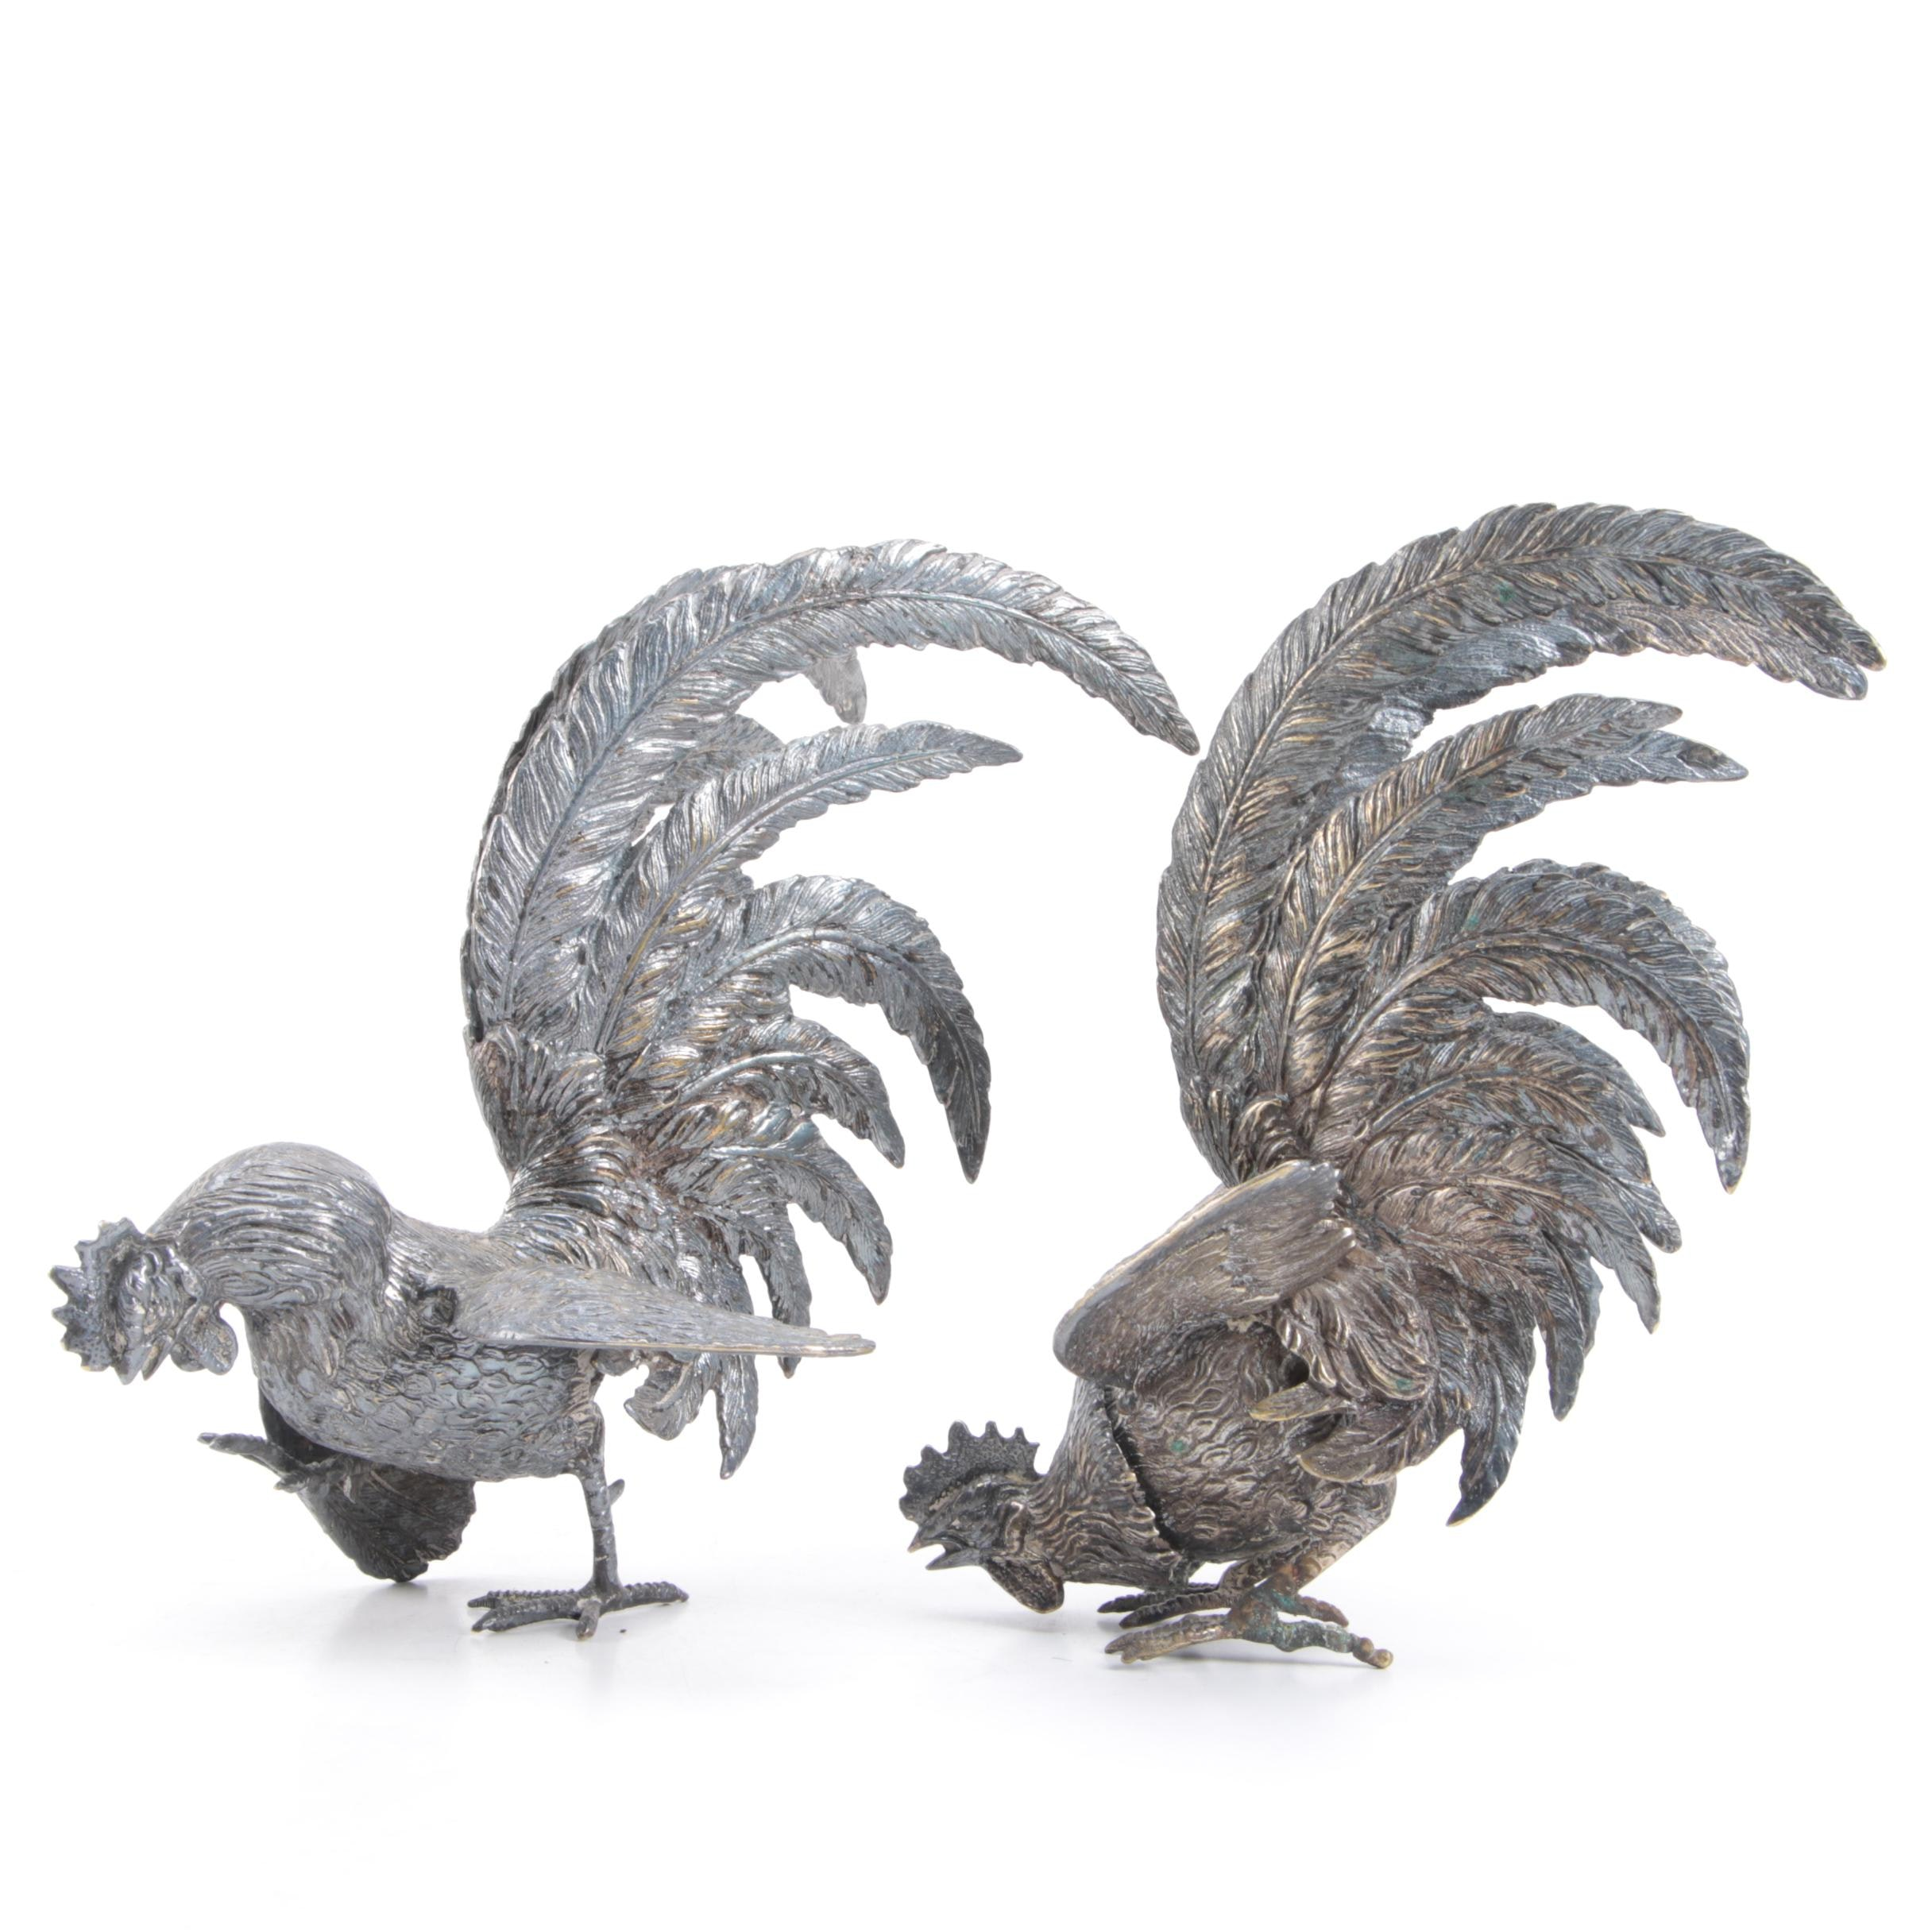 Metal Fighting Rooster Figurines